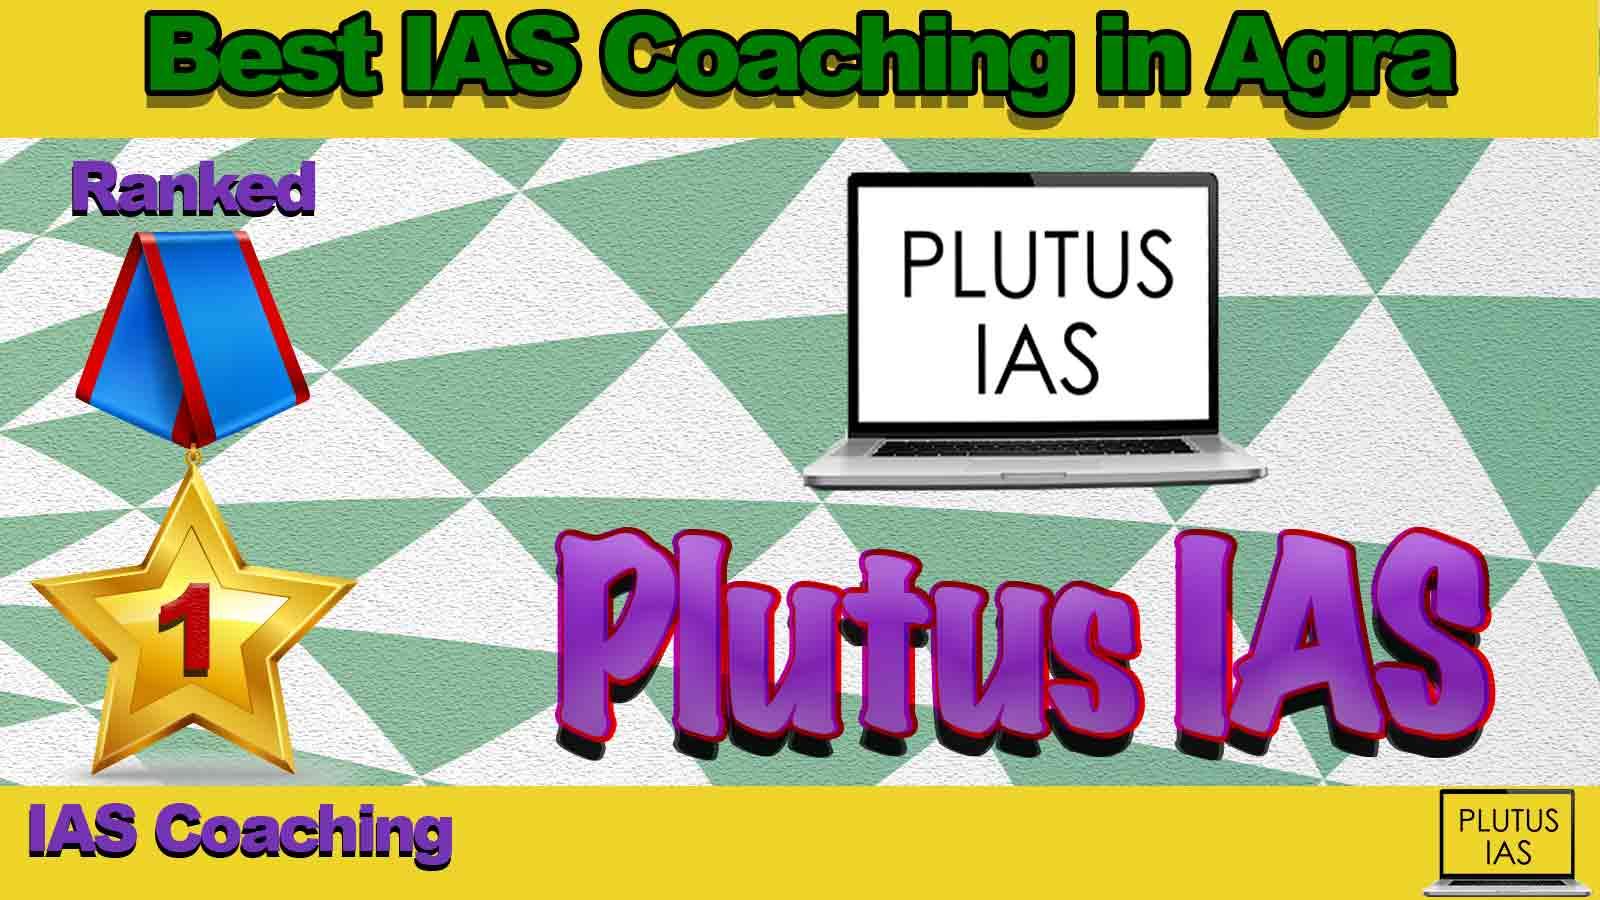 Best IAS Coaching in Agra